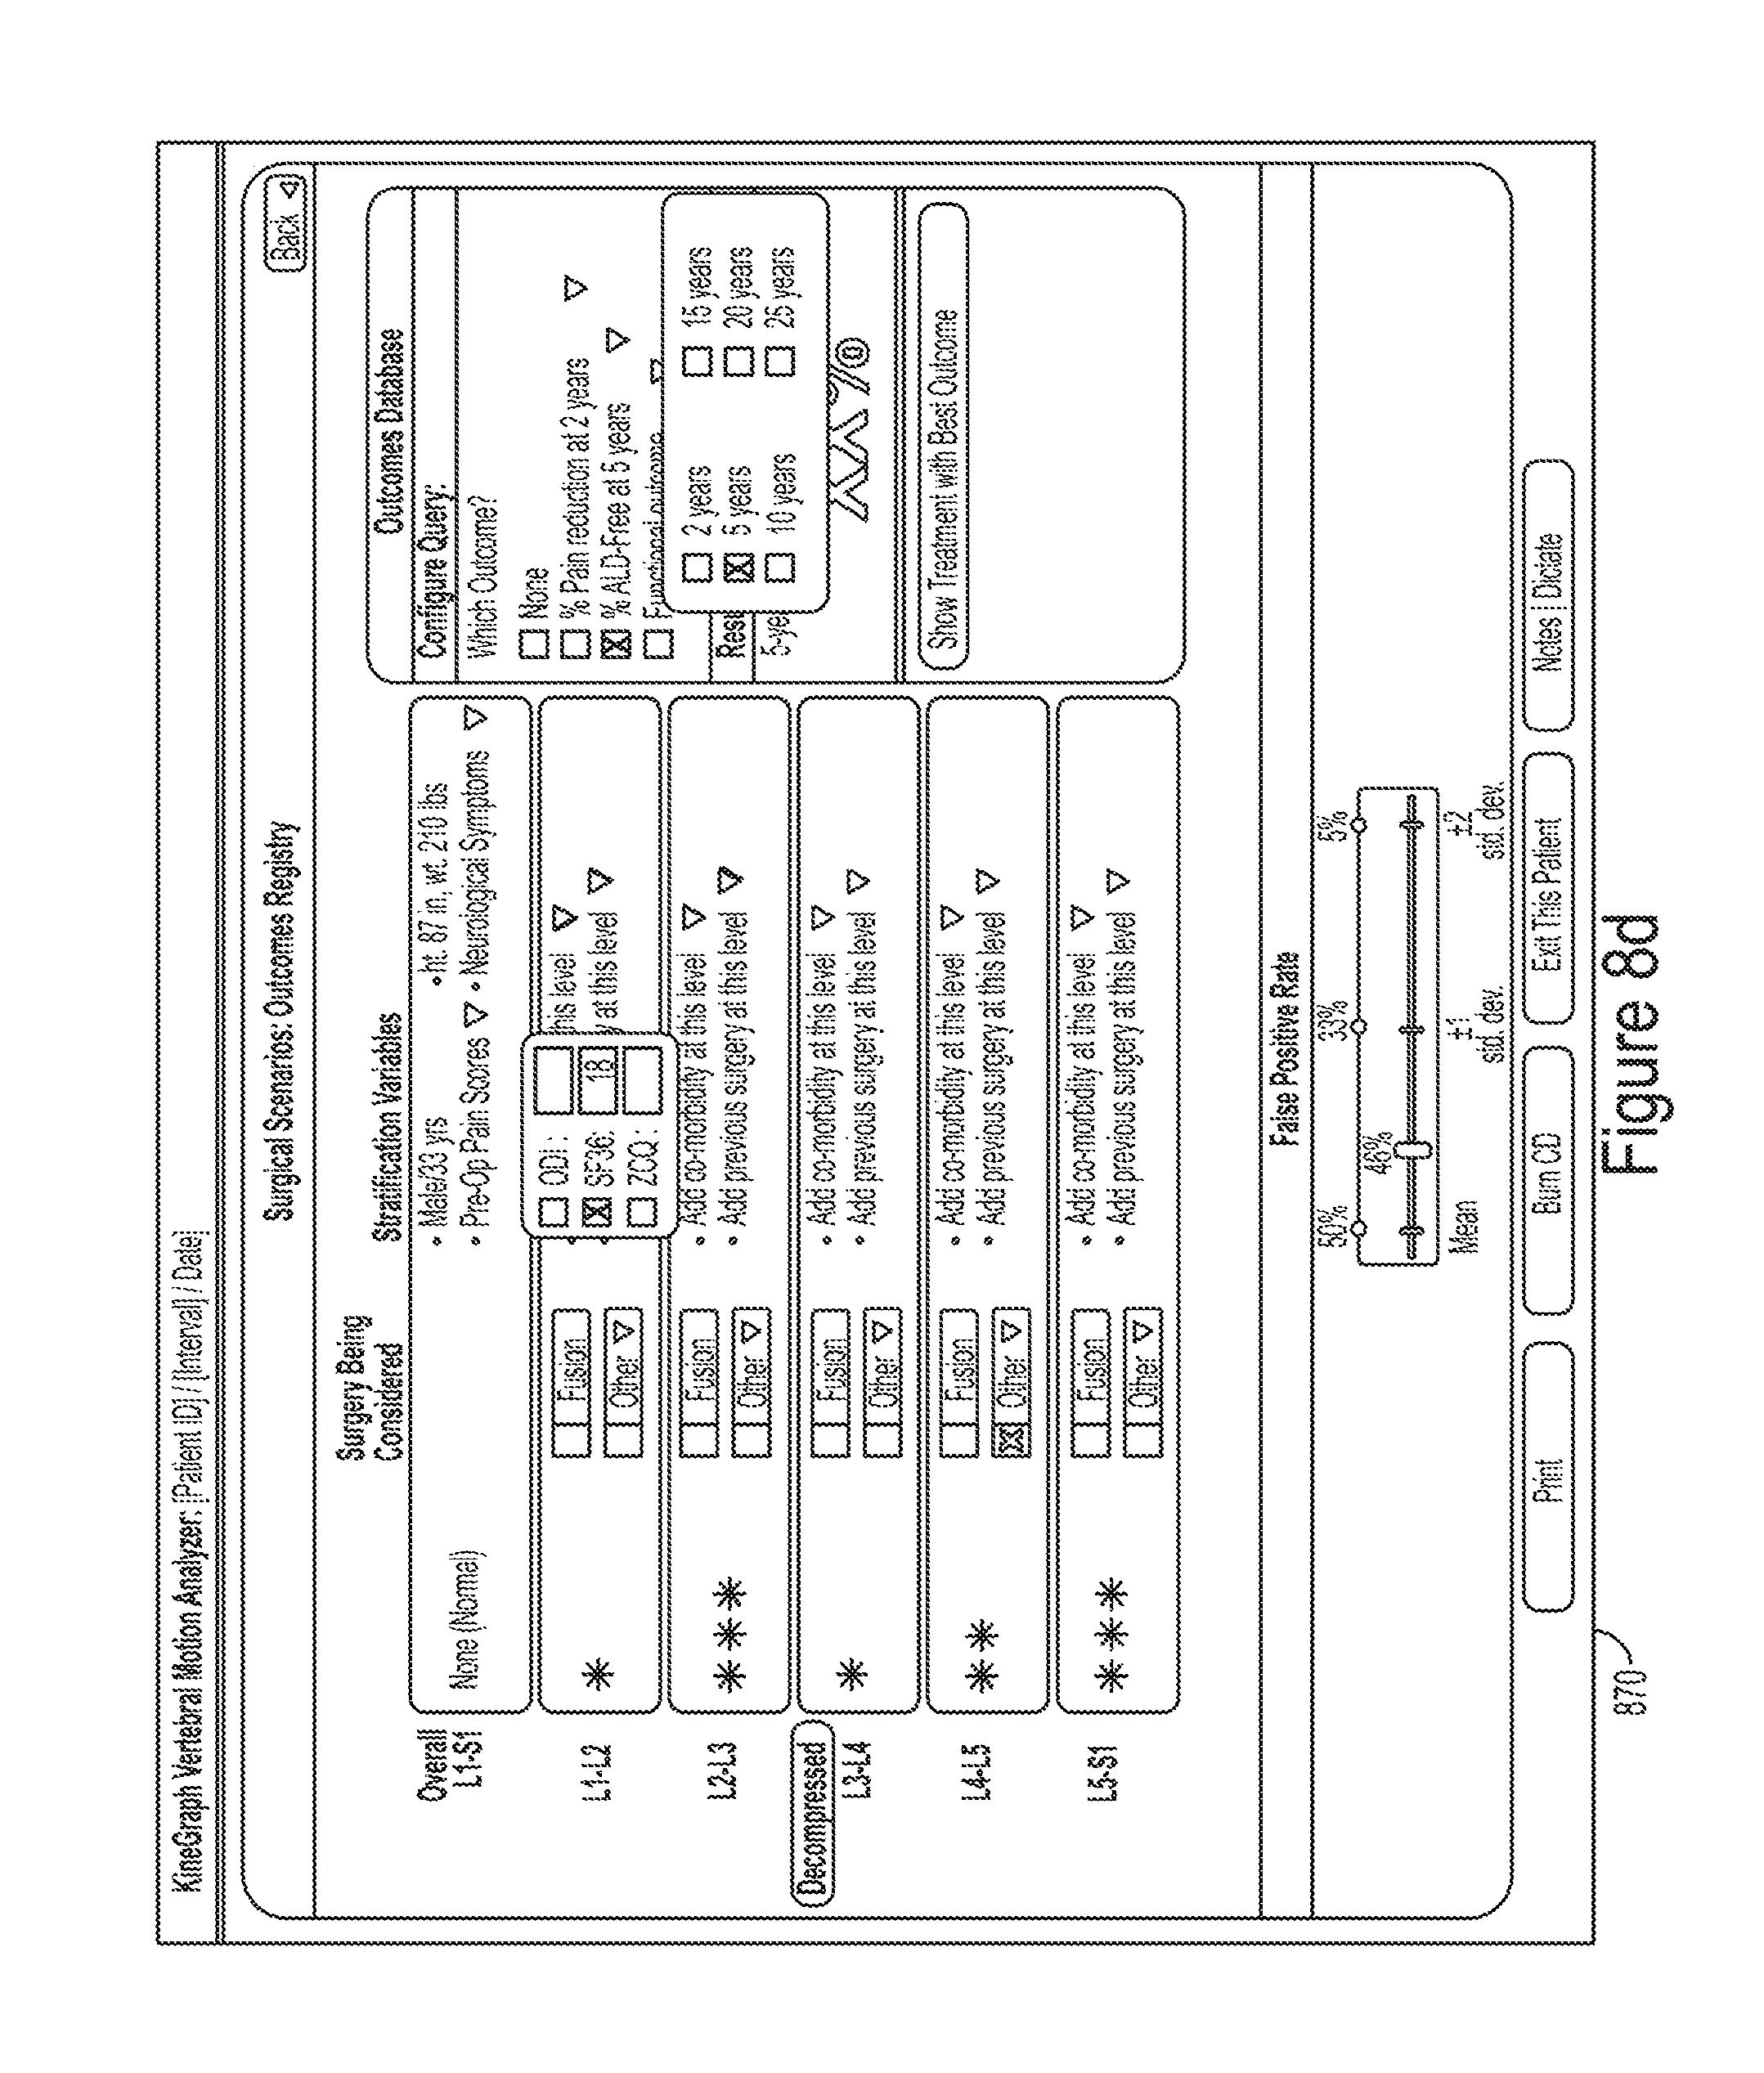 Patent US 9,491,415 B2